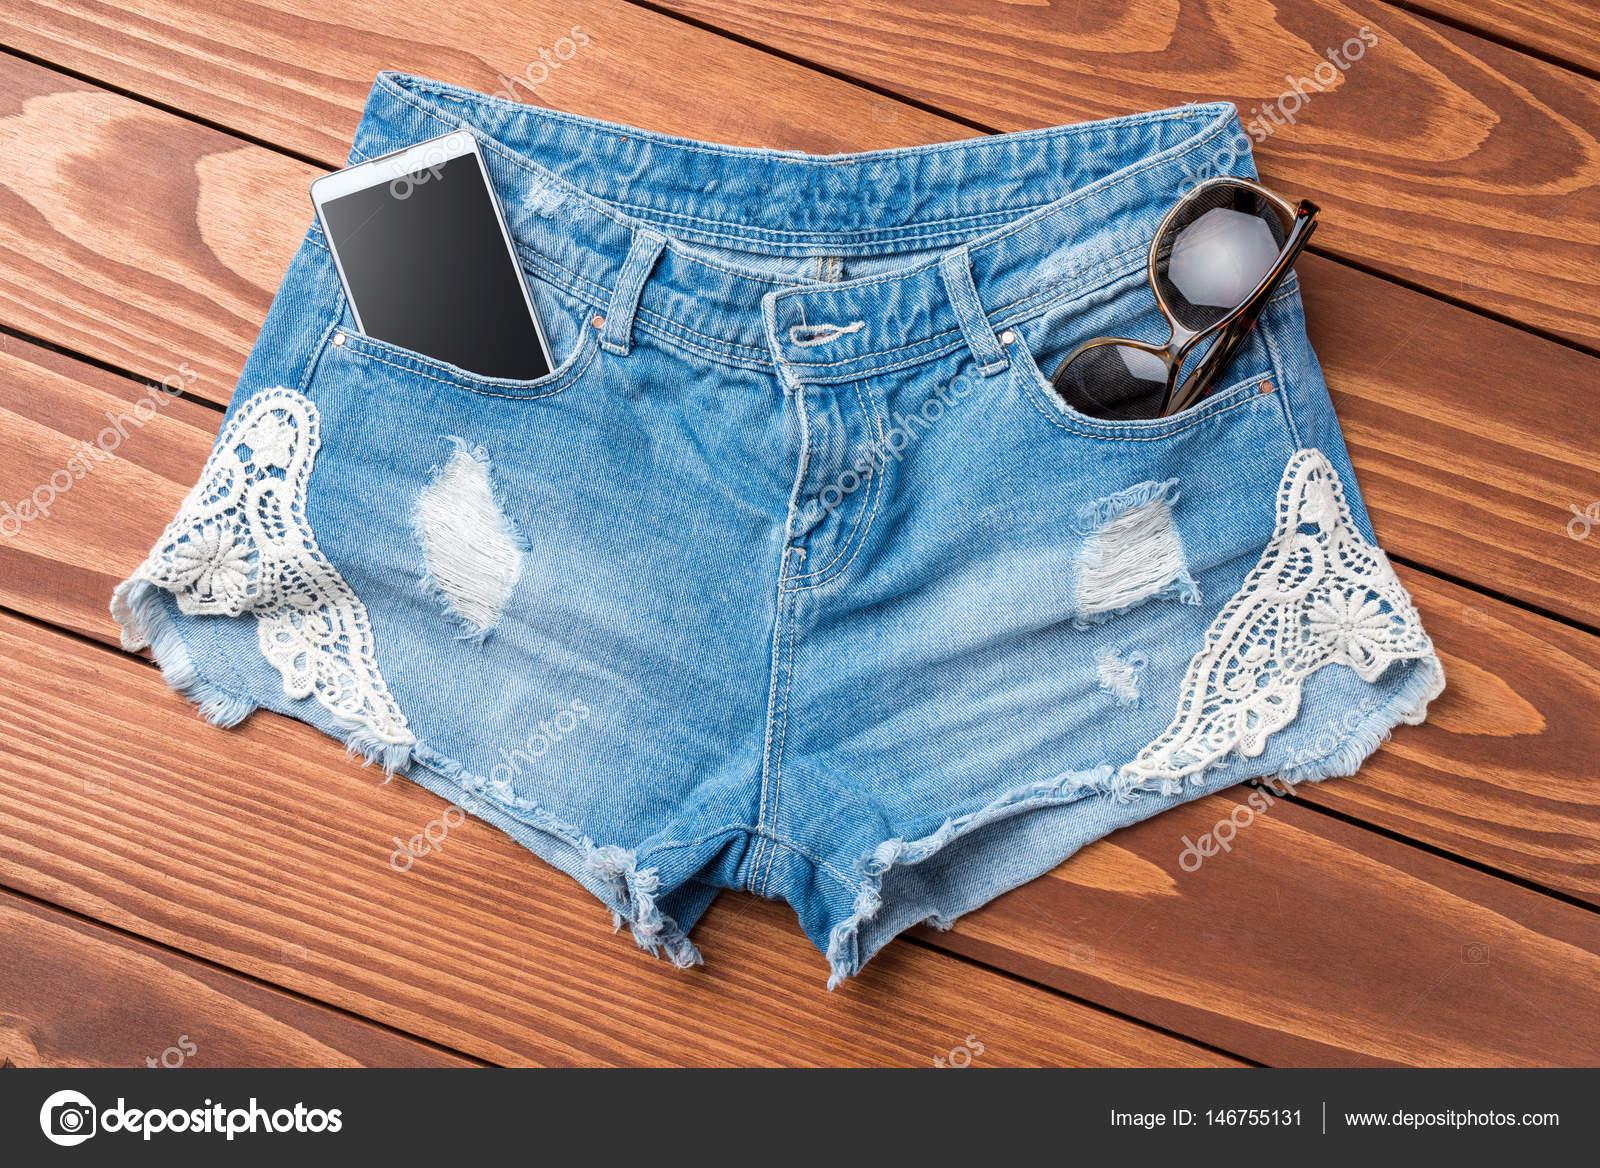 b014582e2e Pantalones Cortos Jeans Mujer Mesa Madera — Foto de stock ...